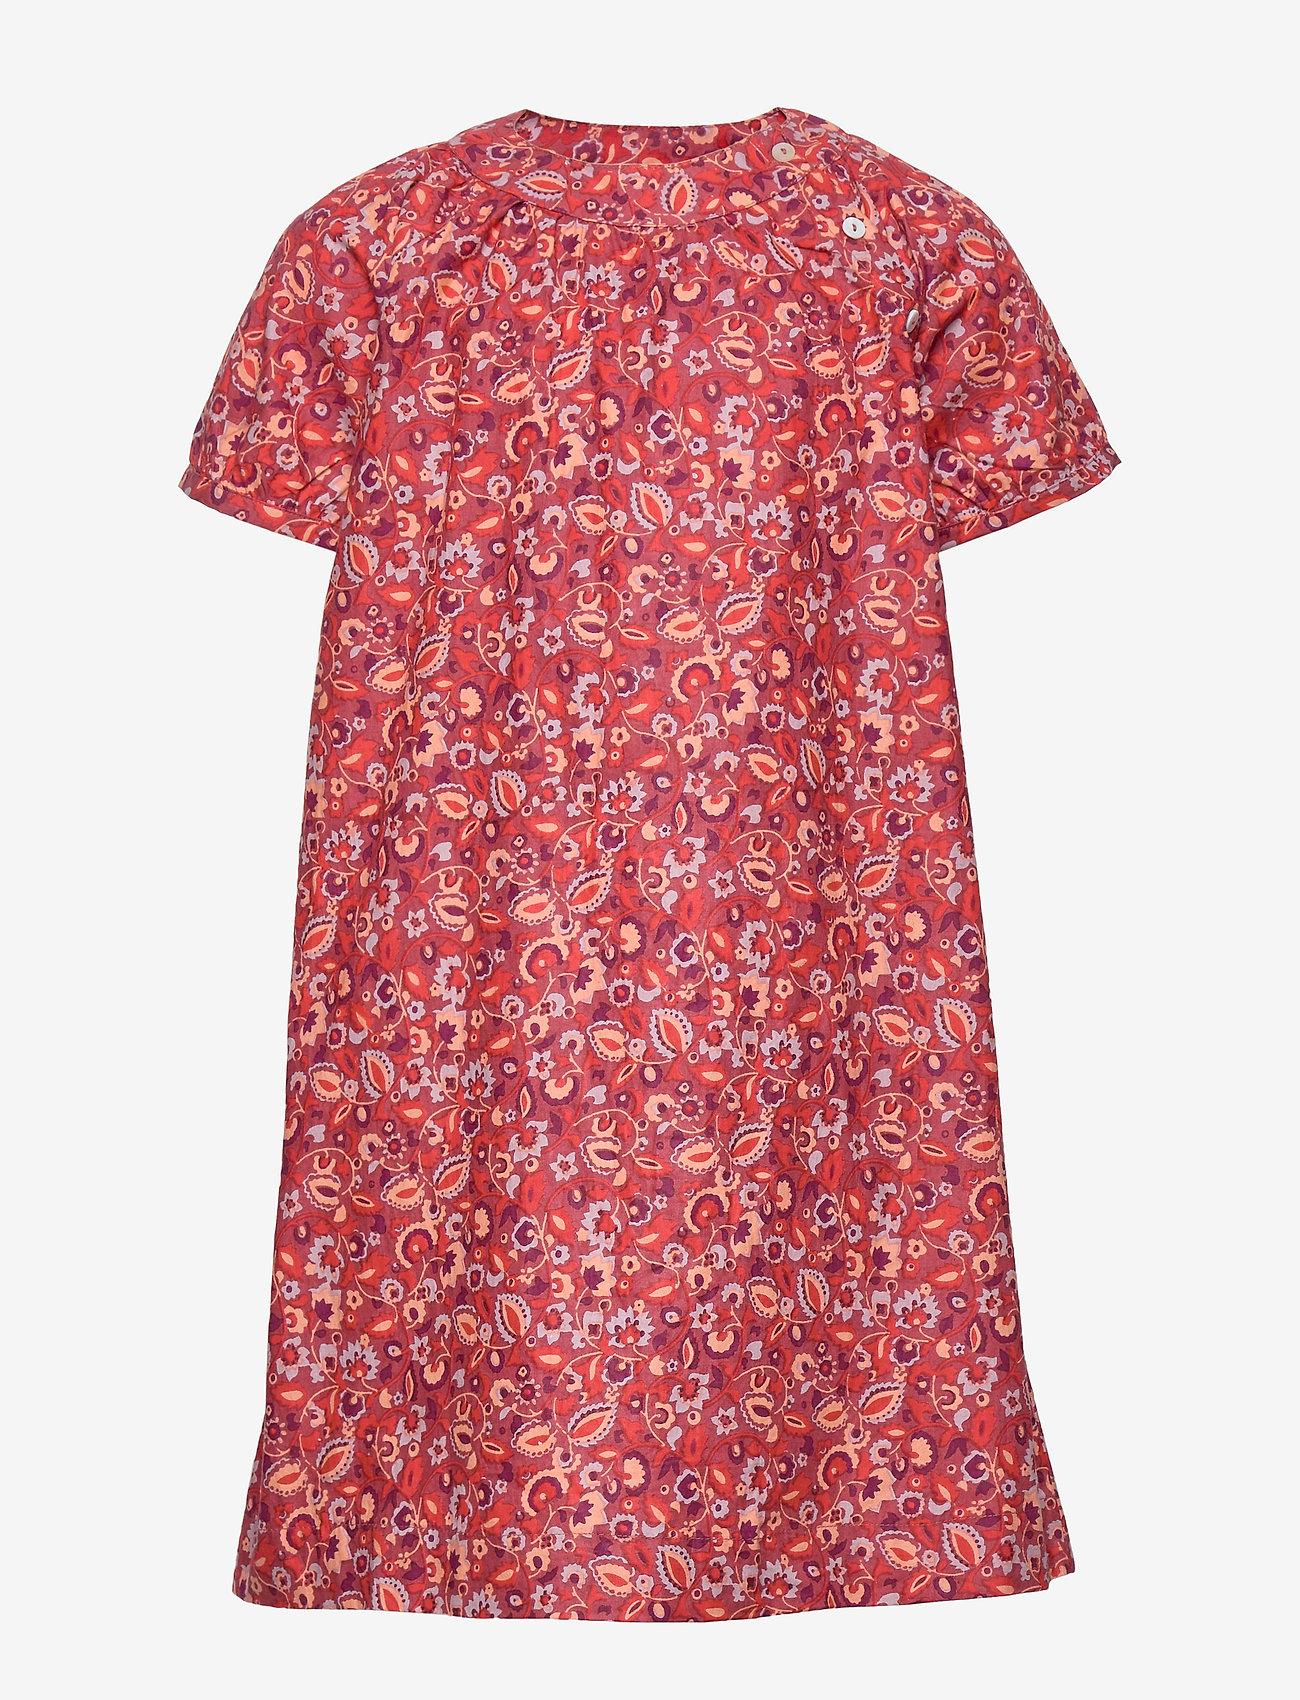 Noa Noa Miniature - Dress short sleeve - dresses - baroque rose - 0